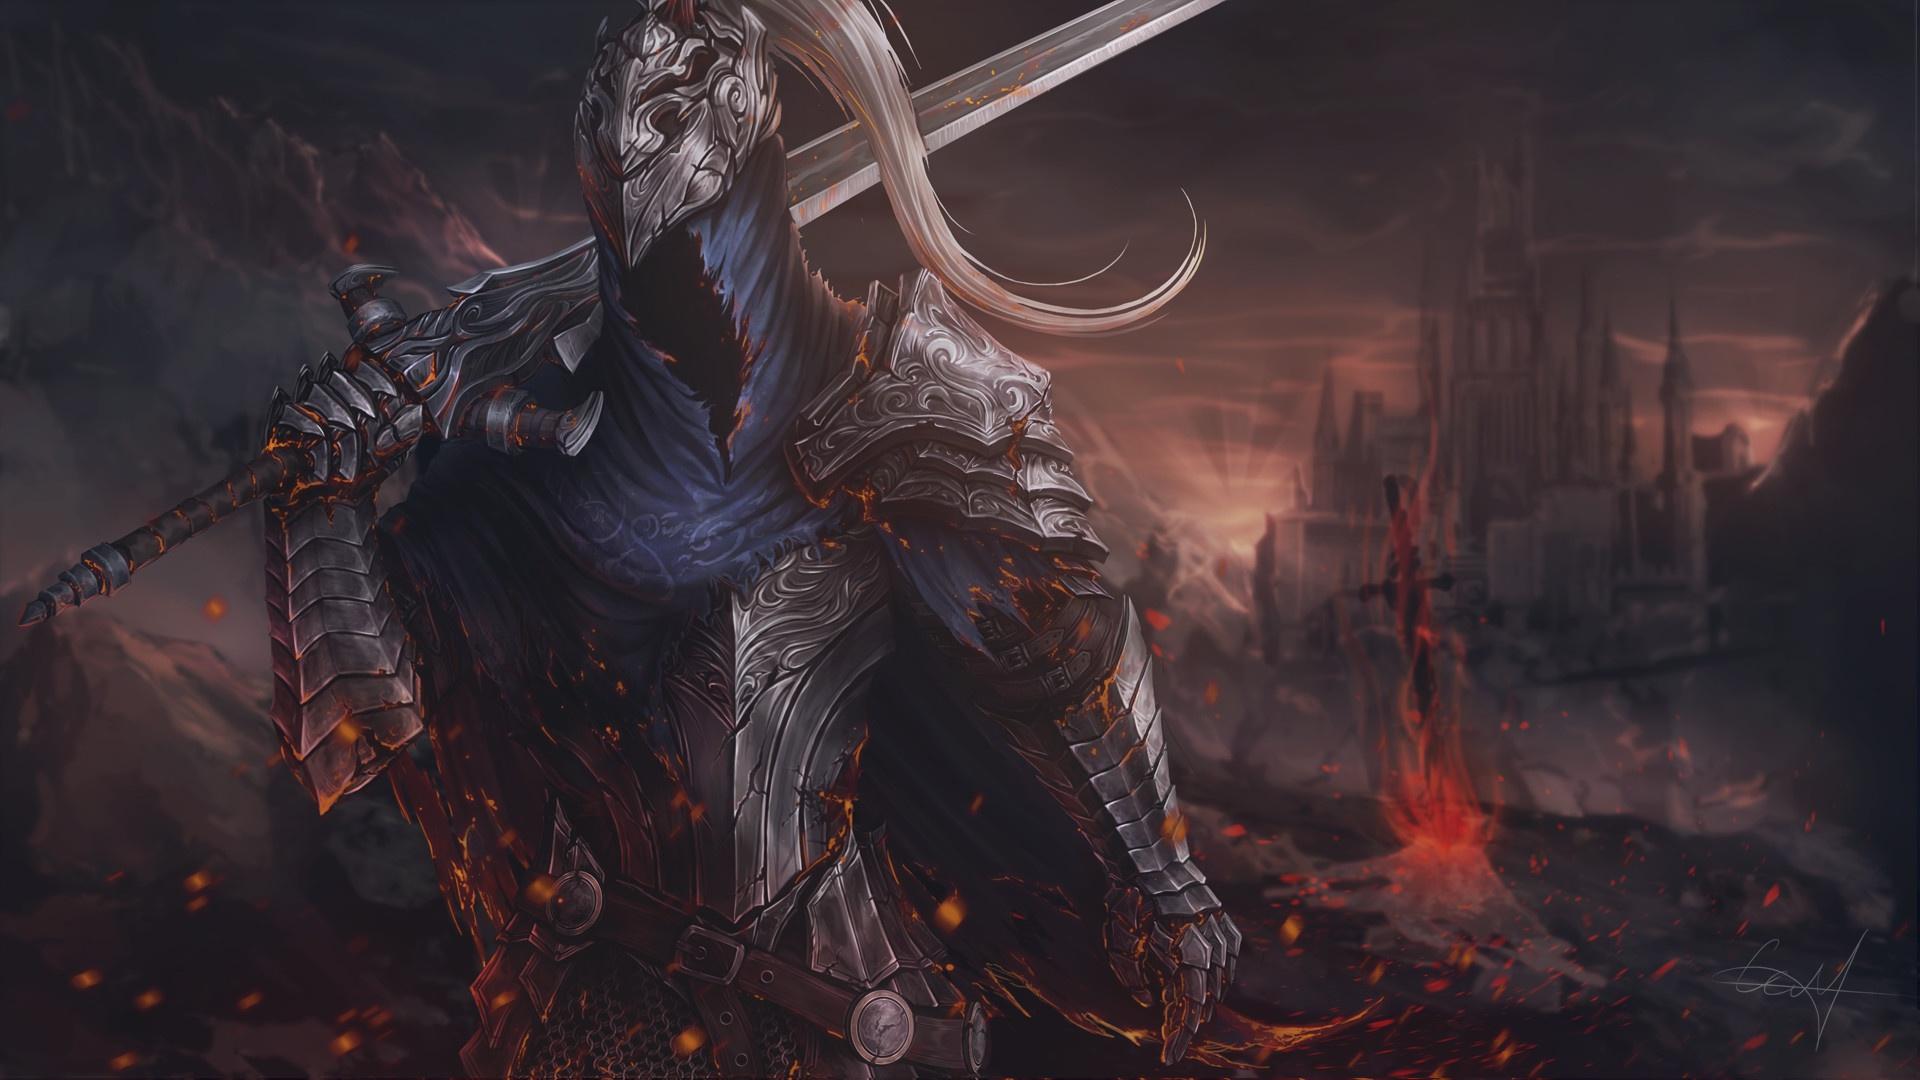 Dark Souls Hd Wallpaper Background Image 1920x1080 Id 975247